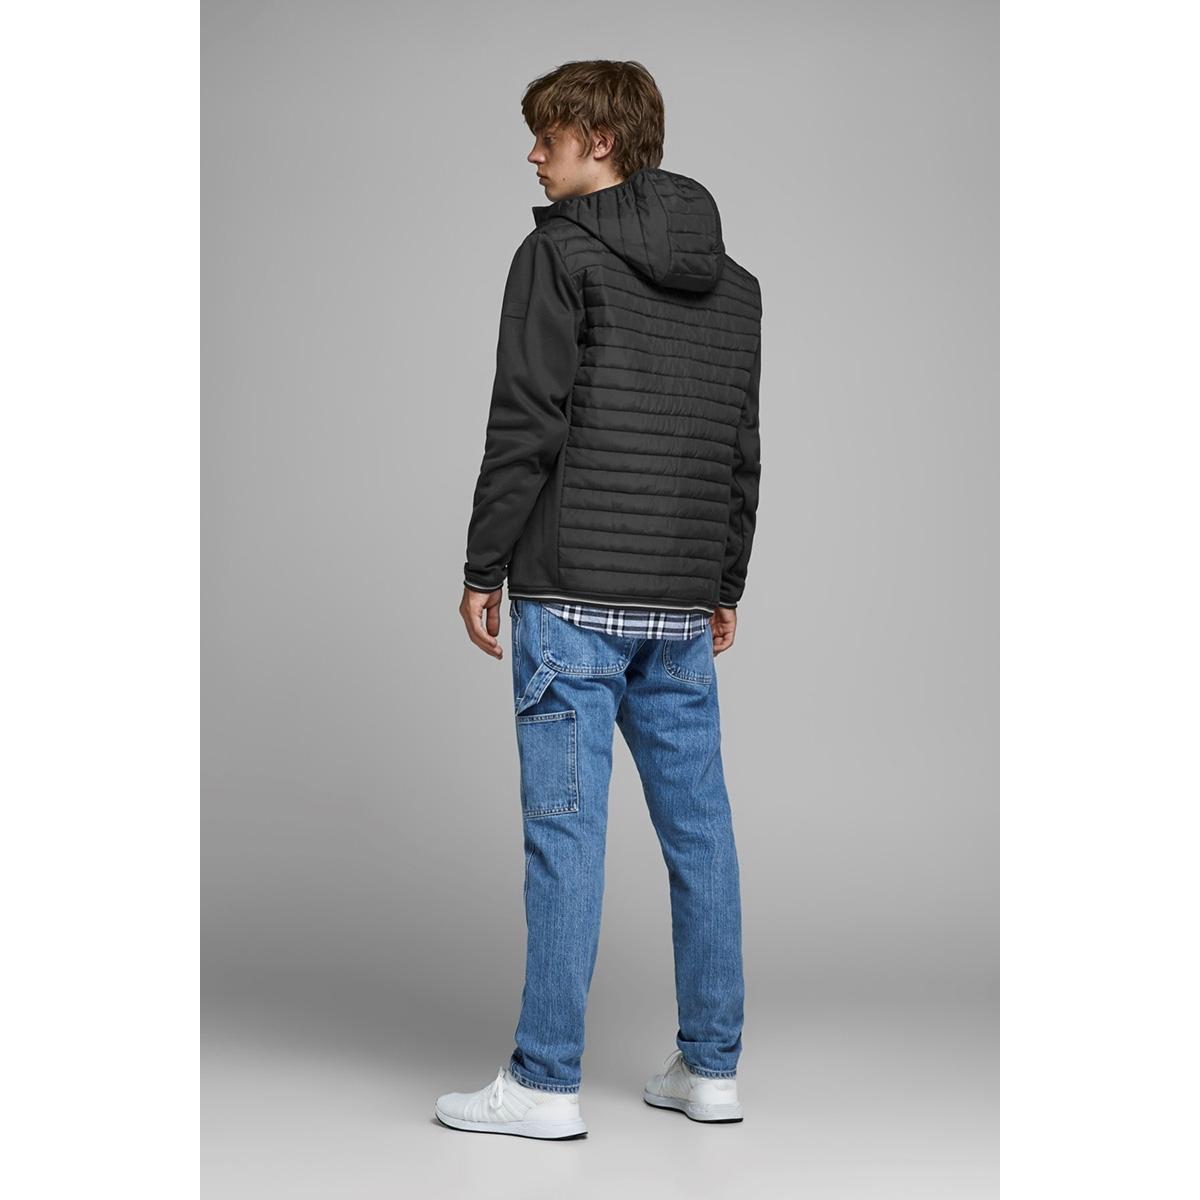 jcotripple jacket noos 12160365 jack & jones jas black